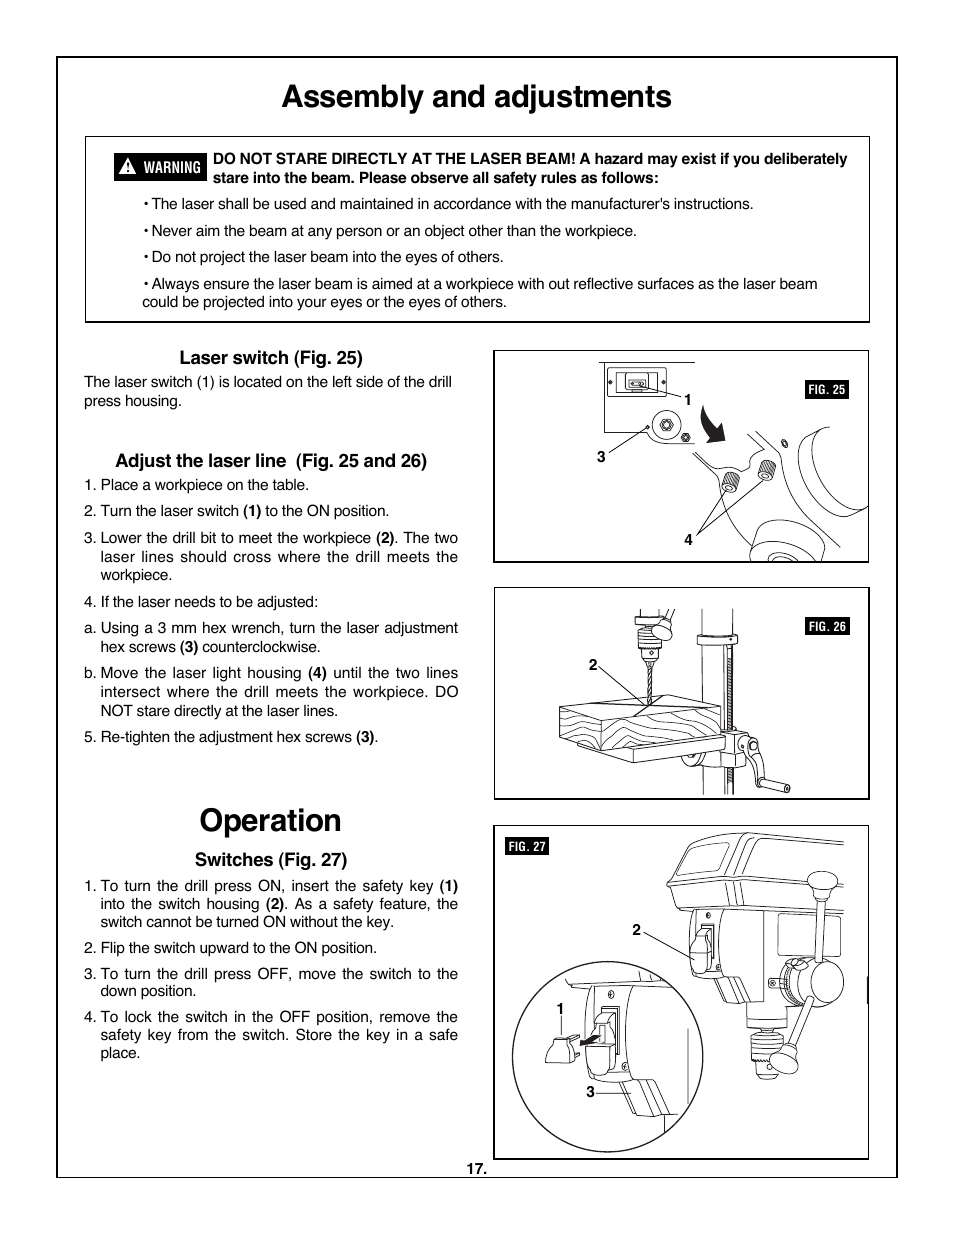 operation assembly and adjustments skil 3320 01 user manual rh manualsdir com